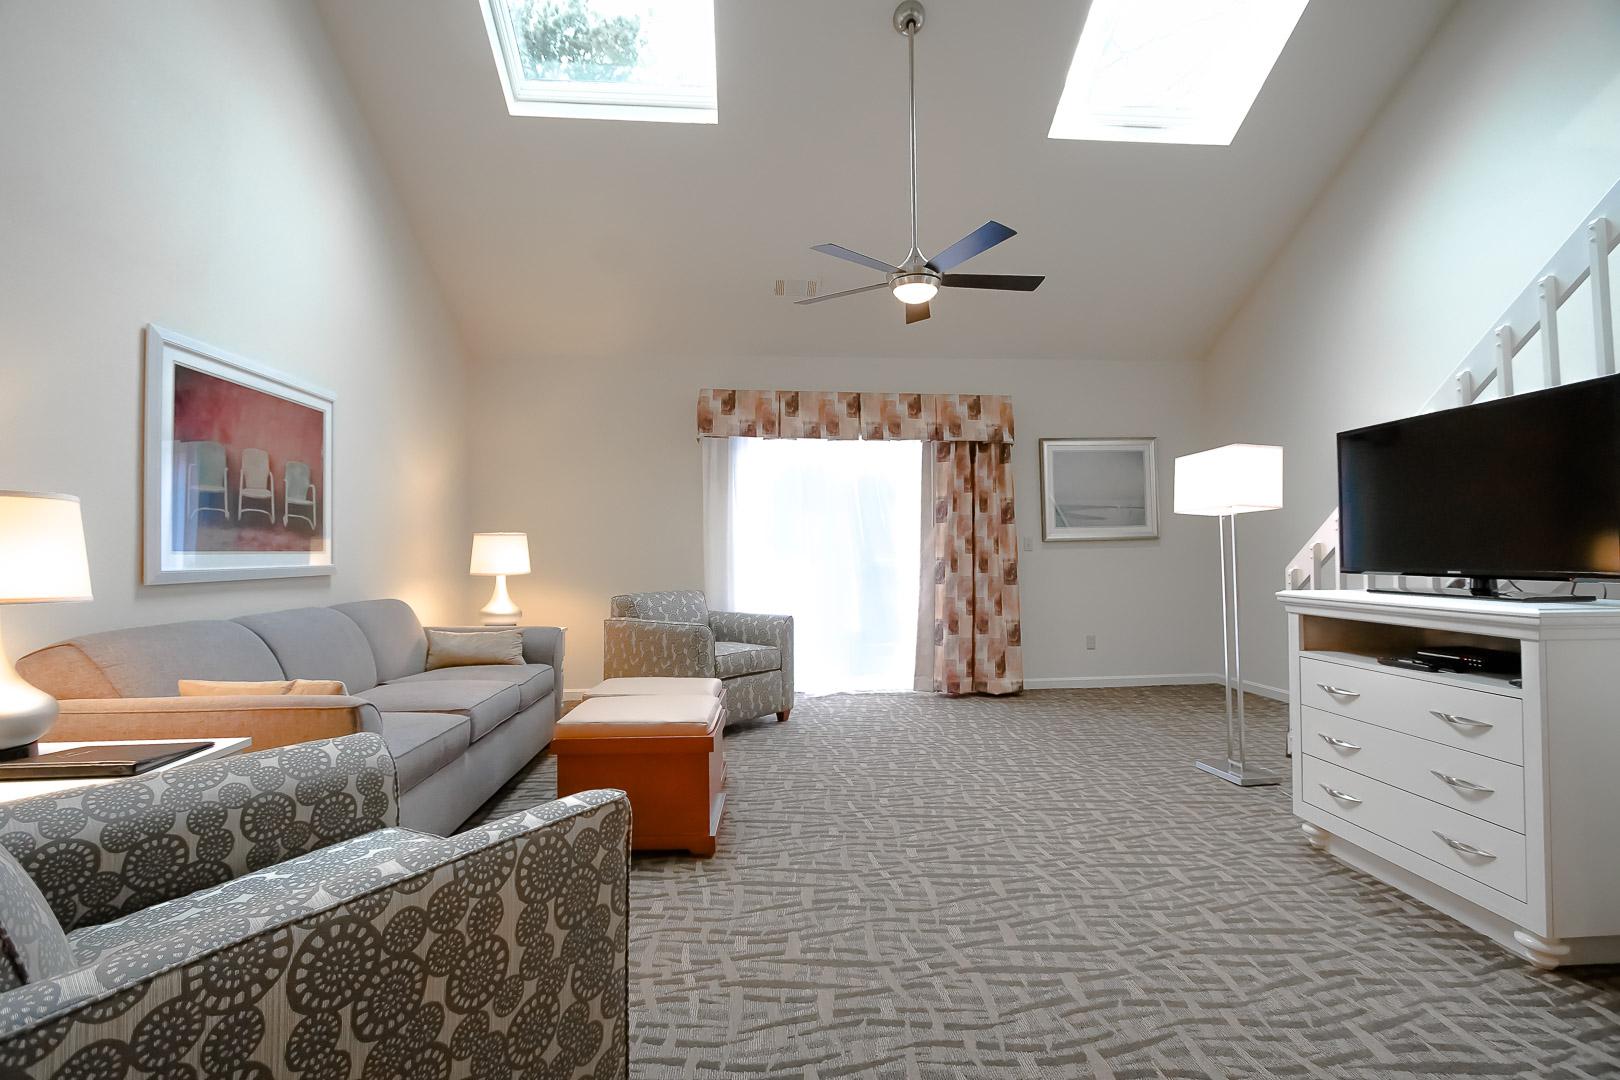 A spacious living room area at VRI's Sea Mist Resort in Massachusetts.